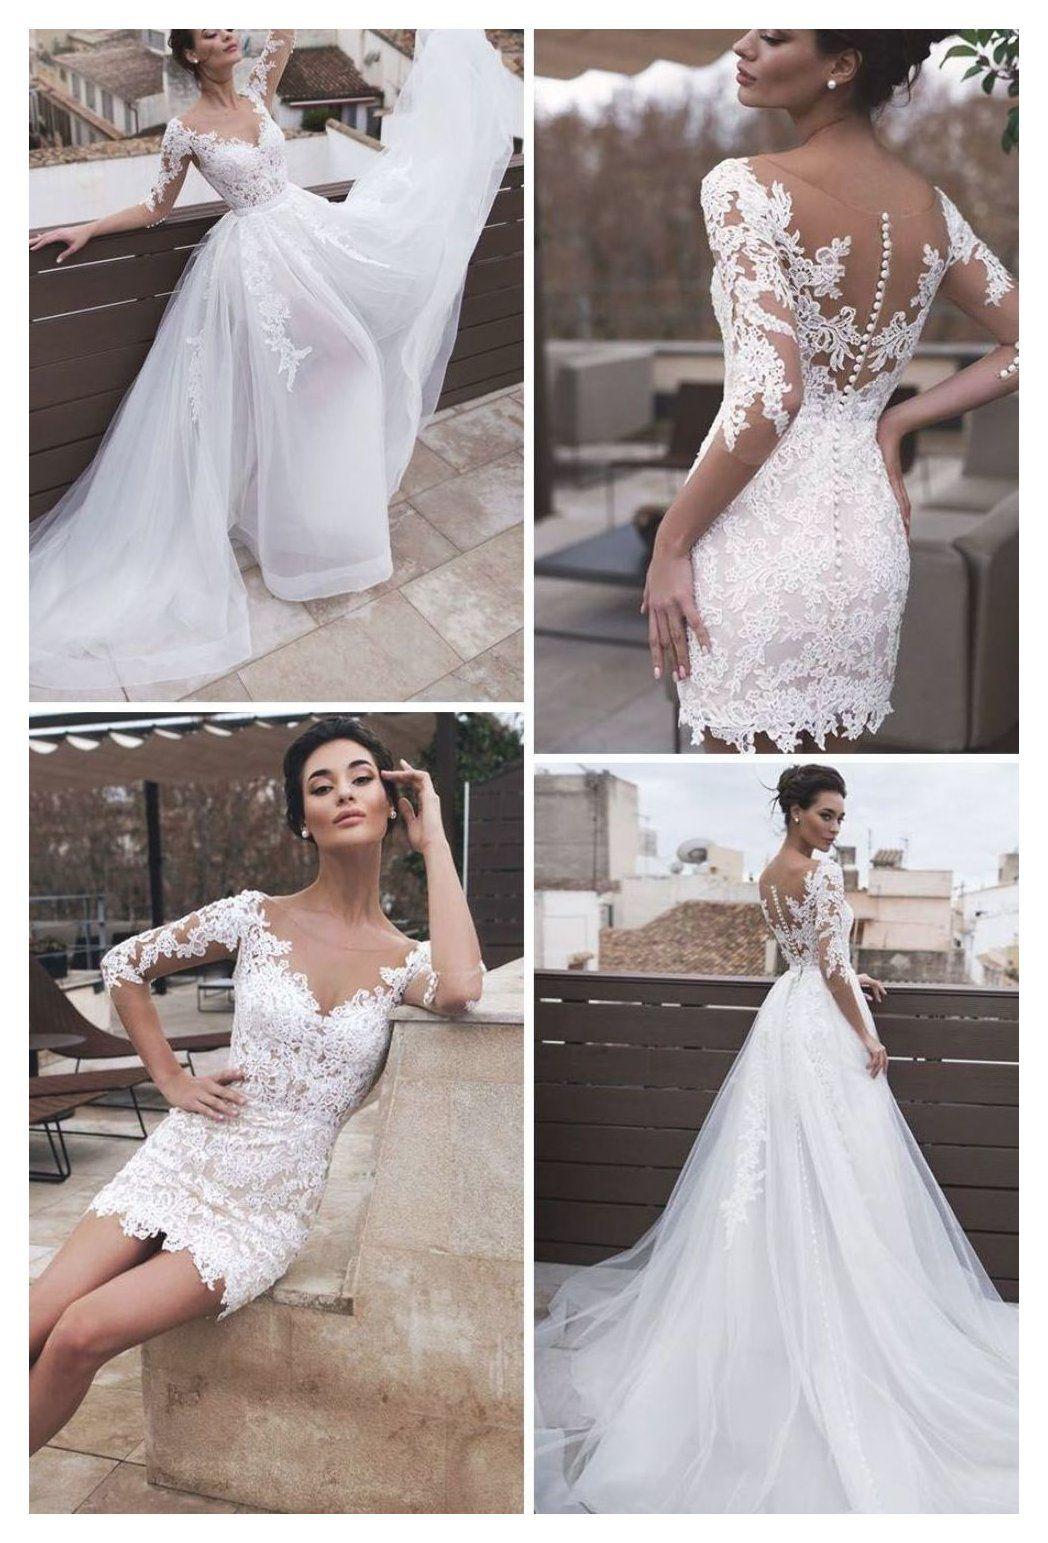 Short Wedding Dress With Detachable Skirt Shortweddingdresswithdetachableskirt Wedding Dress Detachable Skirt Civil Wedding Dresses Short Wedding Dress [ 1543 x 1048 Pixel ]